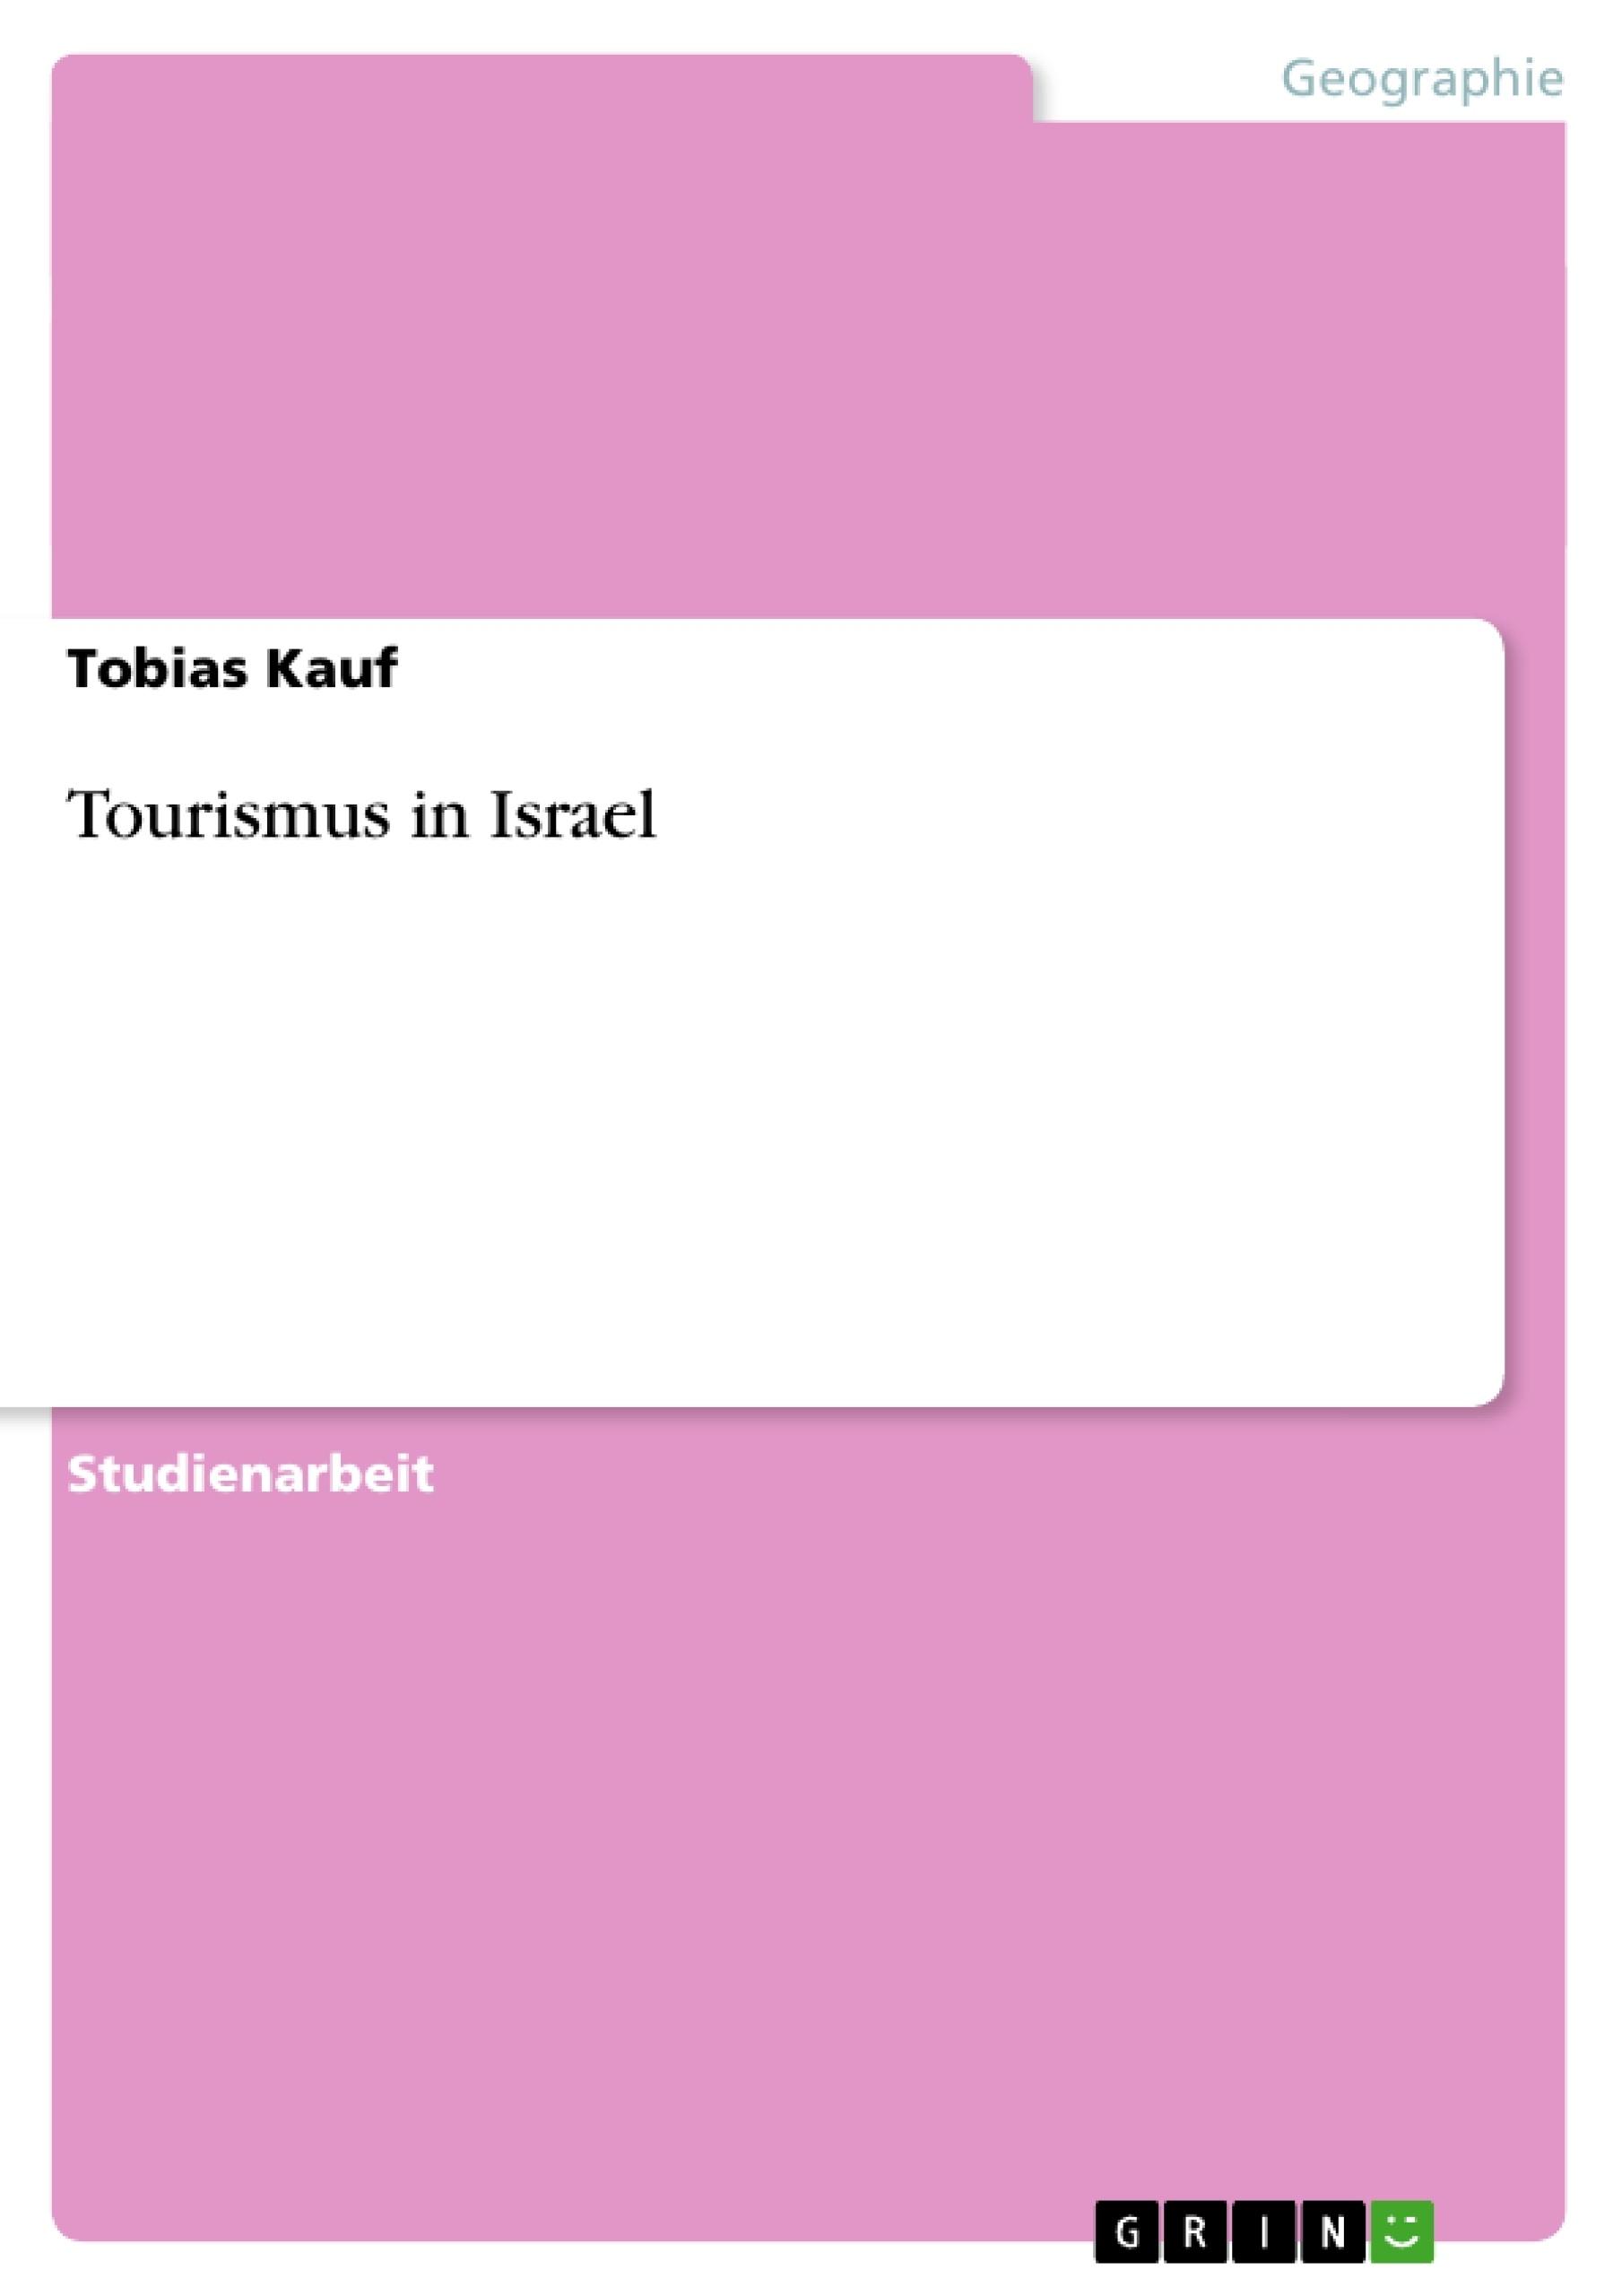 Titel: Tourismus in Israel